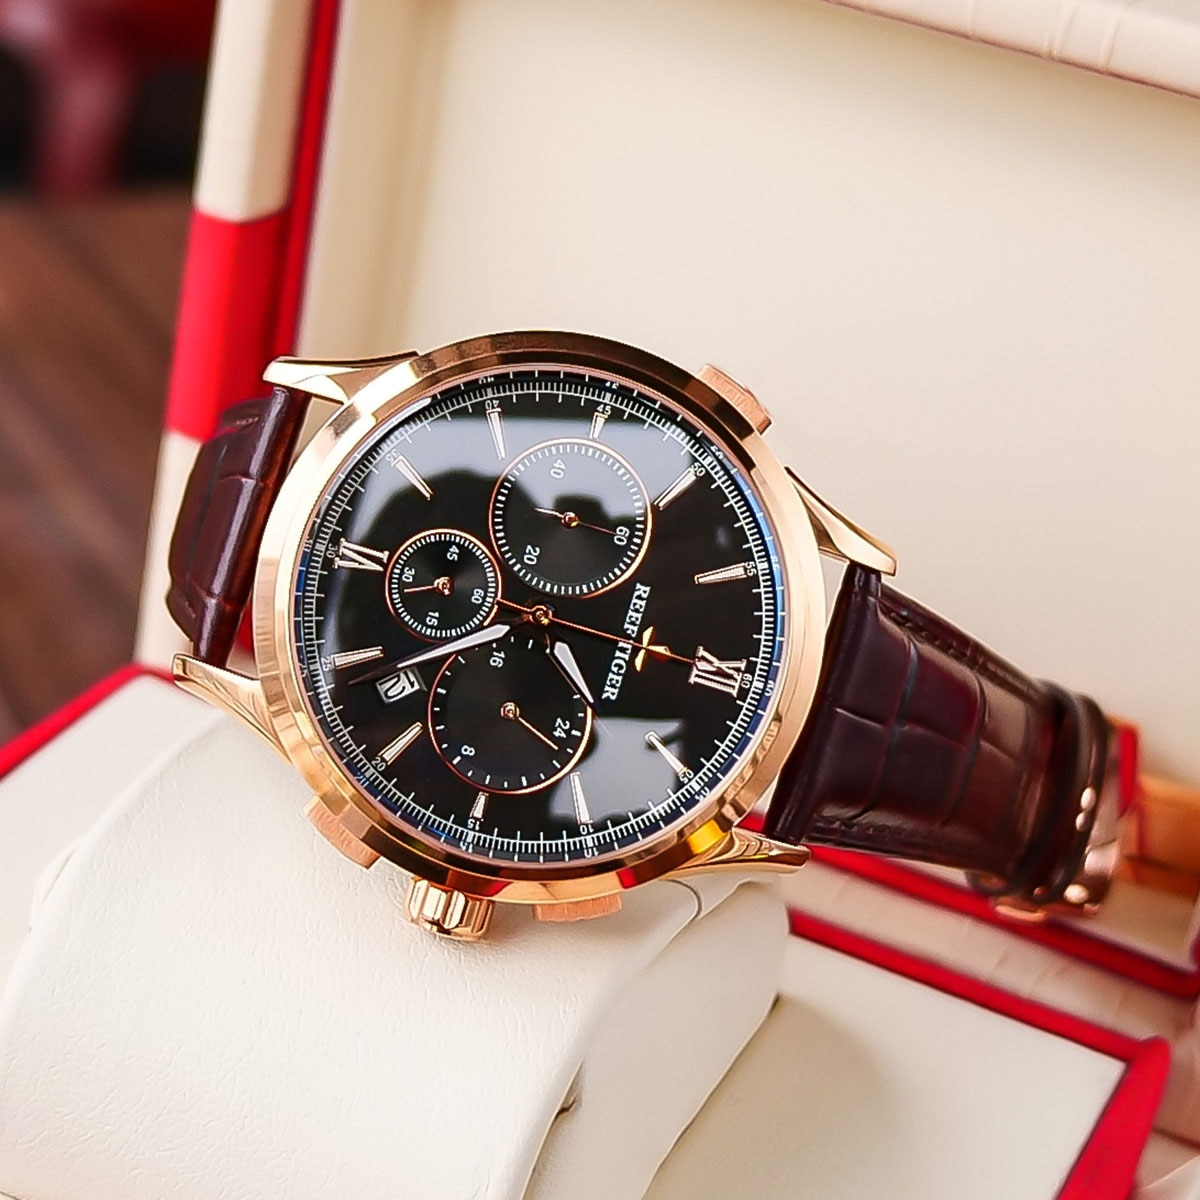 2021 Reef Tiger/RT Luxury Men Casual Watch Black Dial Gold Mens Watch Chronograph Quartz Leather Str